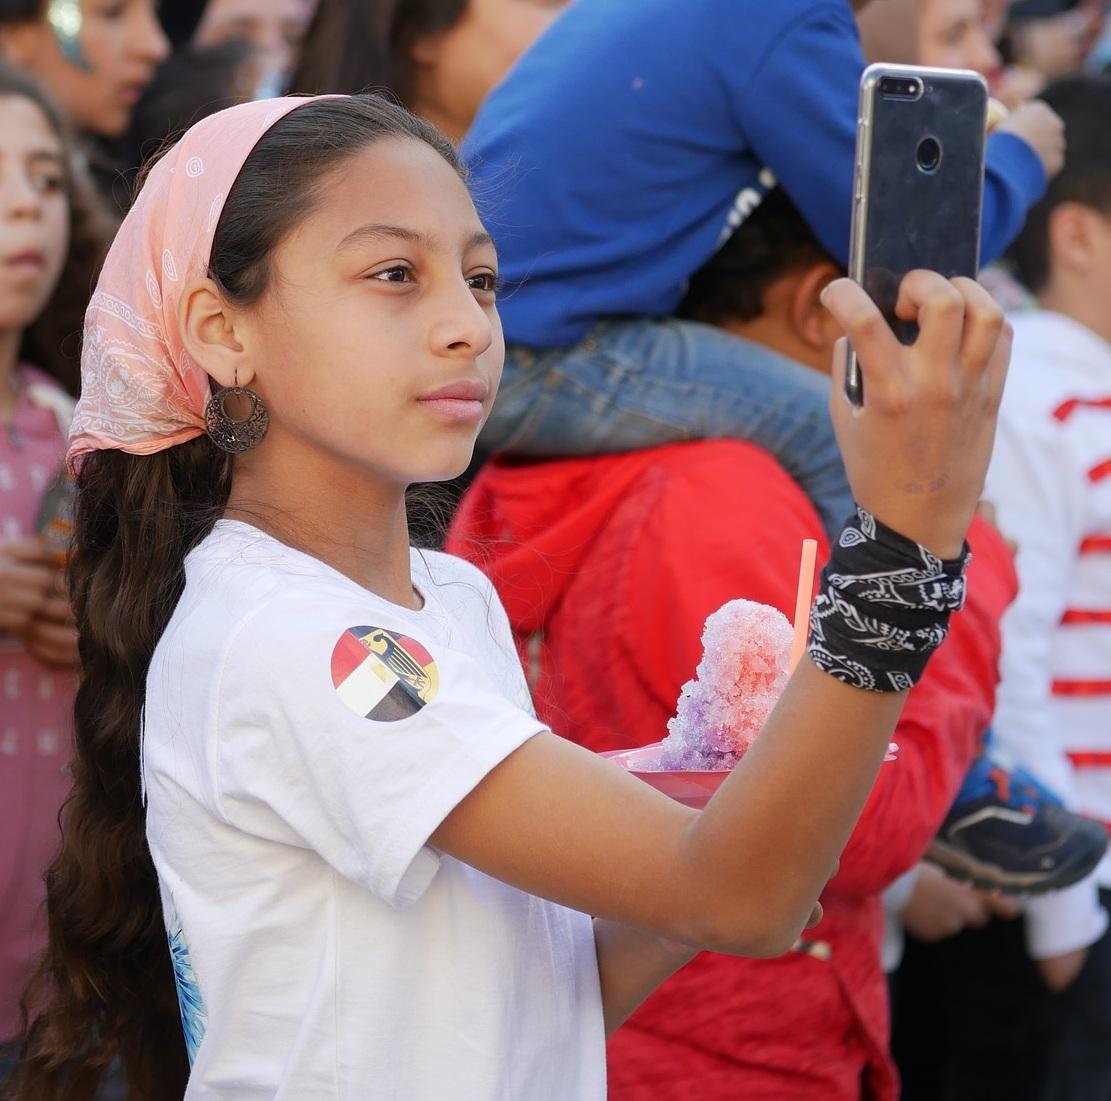 mobile-phone-4194435_1920.jpg